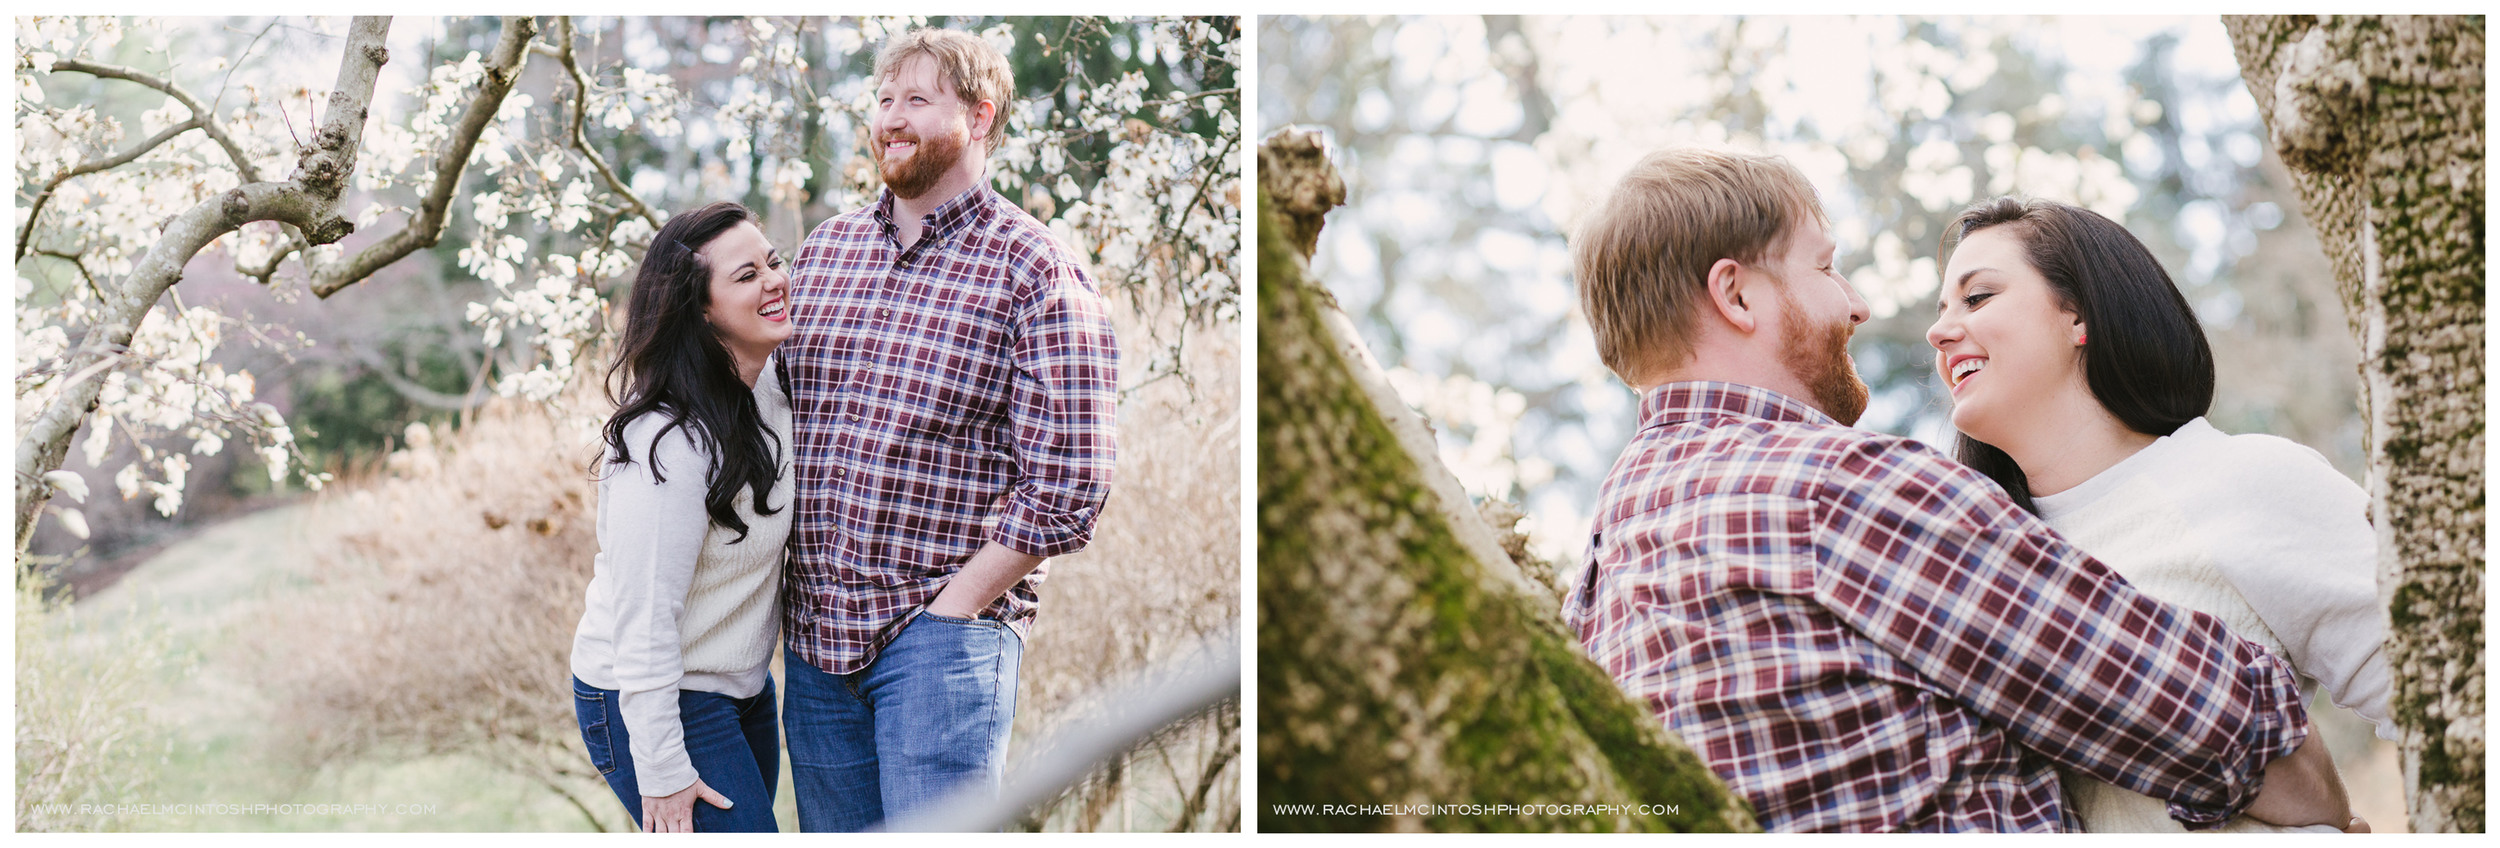 Spring Engagement Session-Asheville Wedding Photographer 4.jpeg